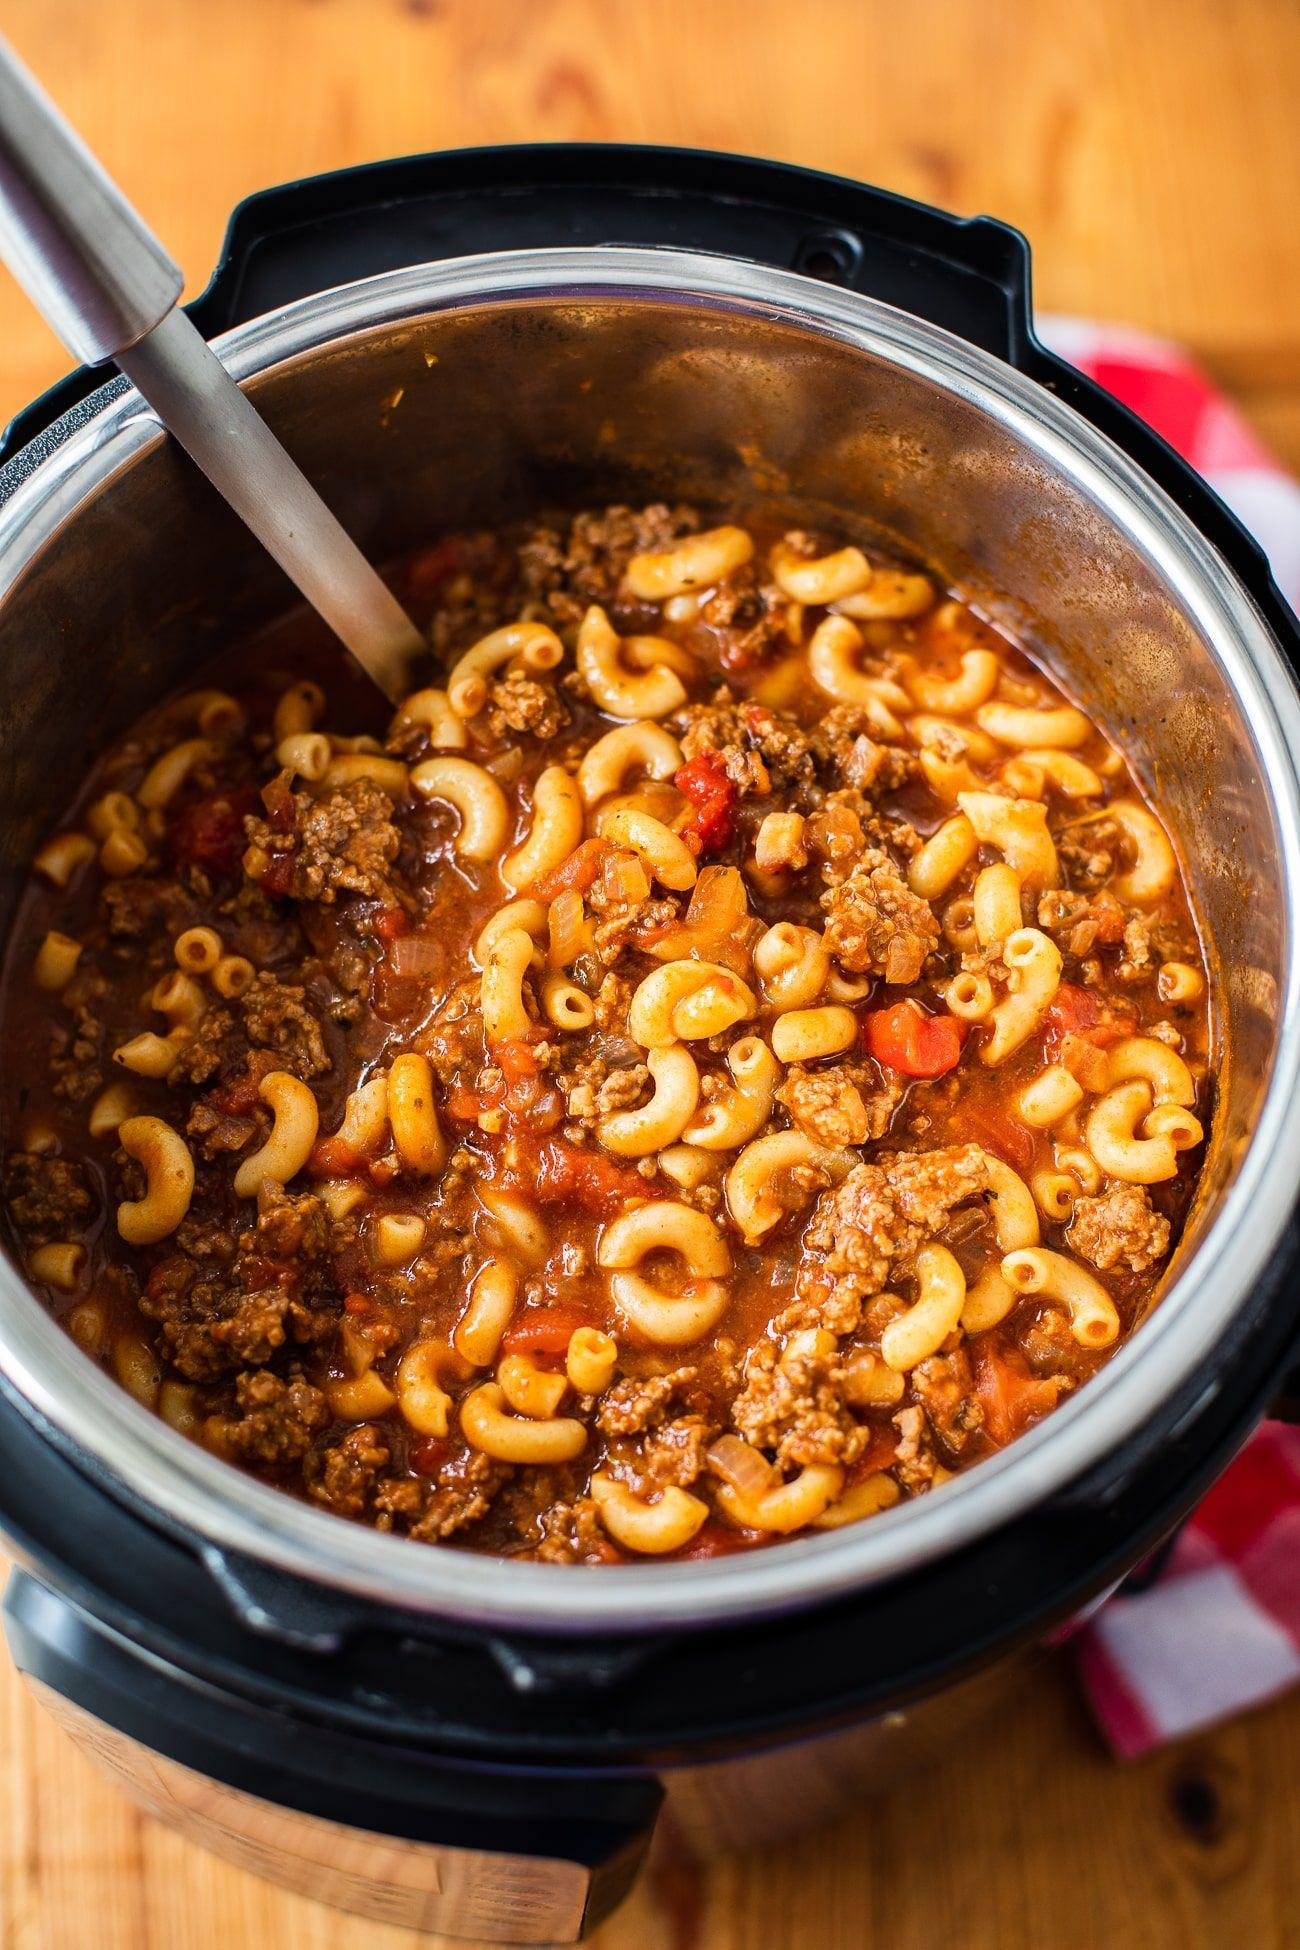 Best Instant Pot Goulash American Goulash Recipe Recipe In 2020 Instant Pot Dinner Recipes Easy Instant Pot Recipes Best Instant Pot Recipe